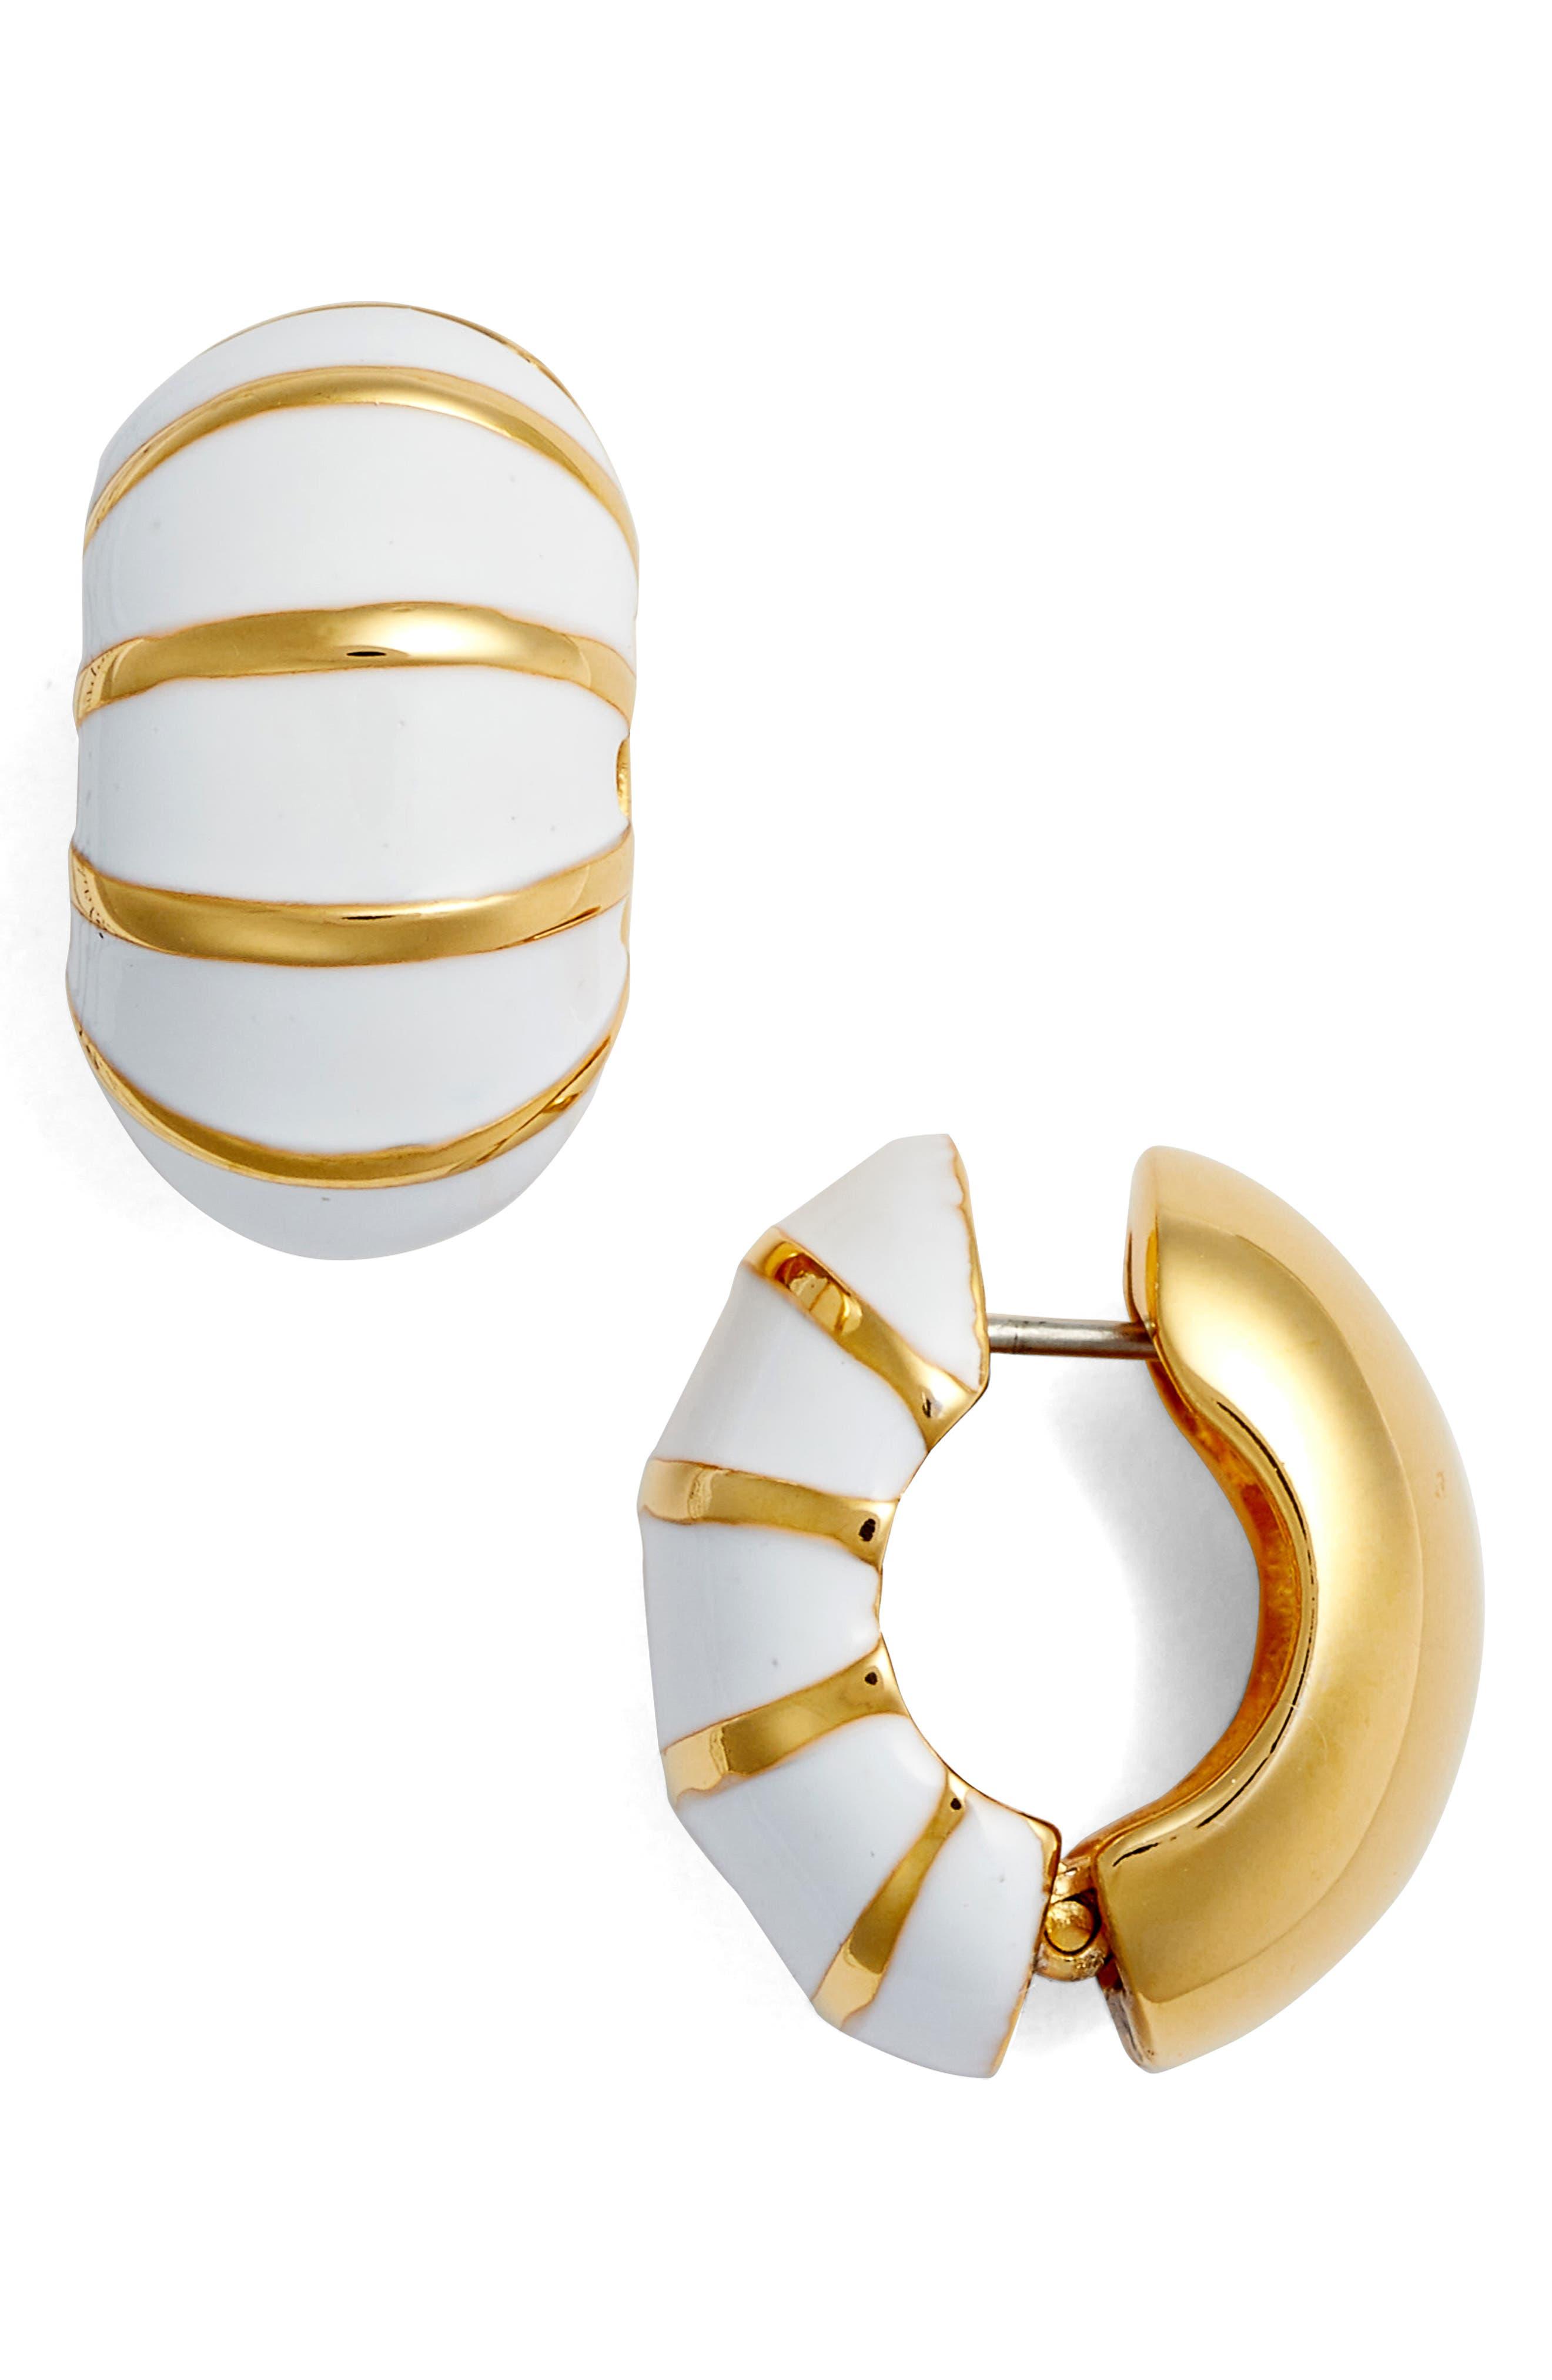 Goldtone & White Reversible Earrings,                             Main thumbnail 1, color,                             White/ Gold